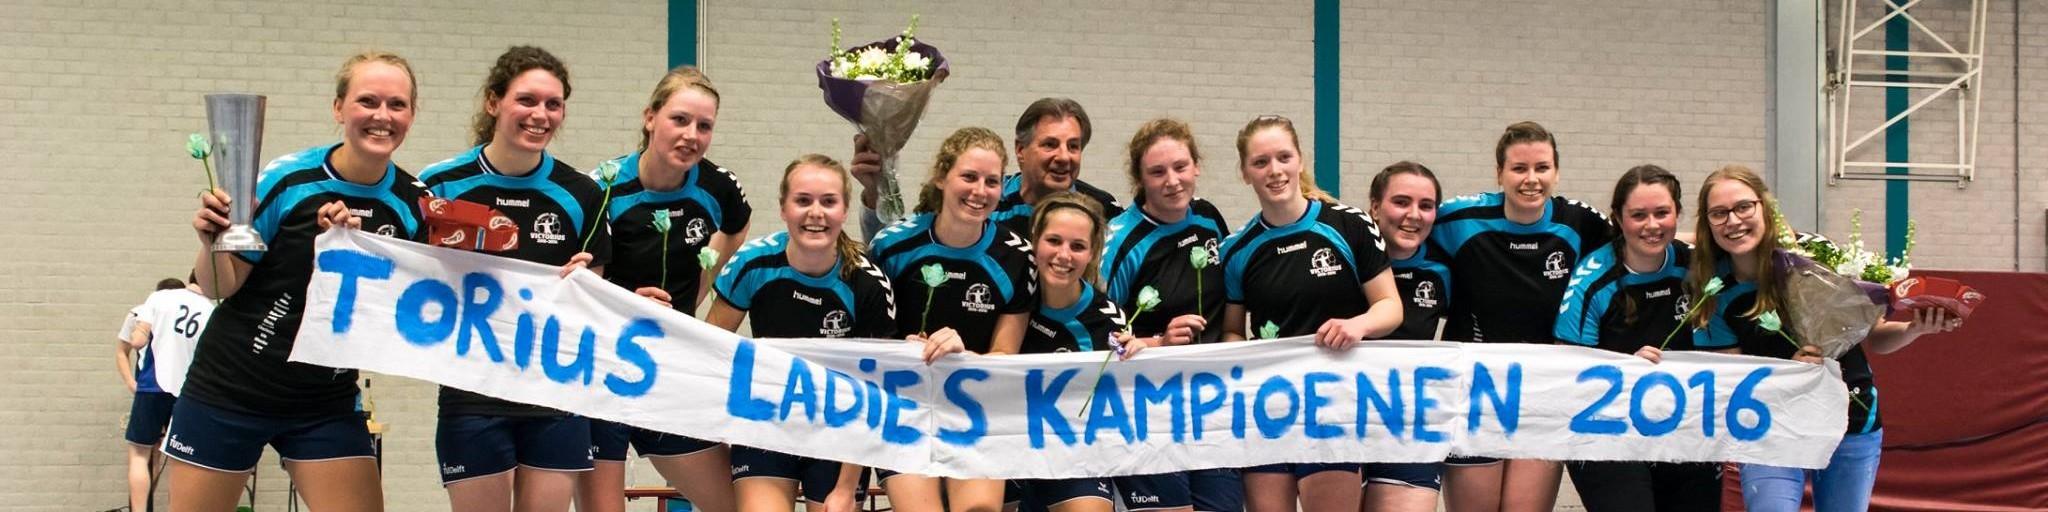 Ladies champion banner